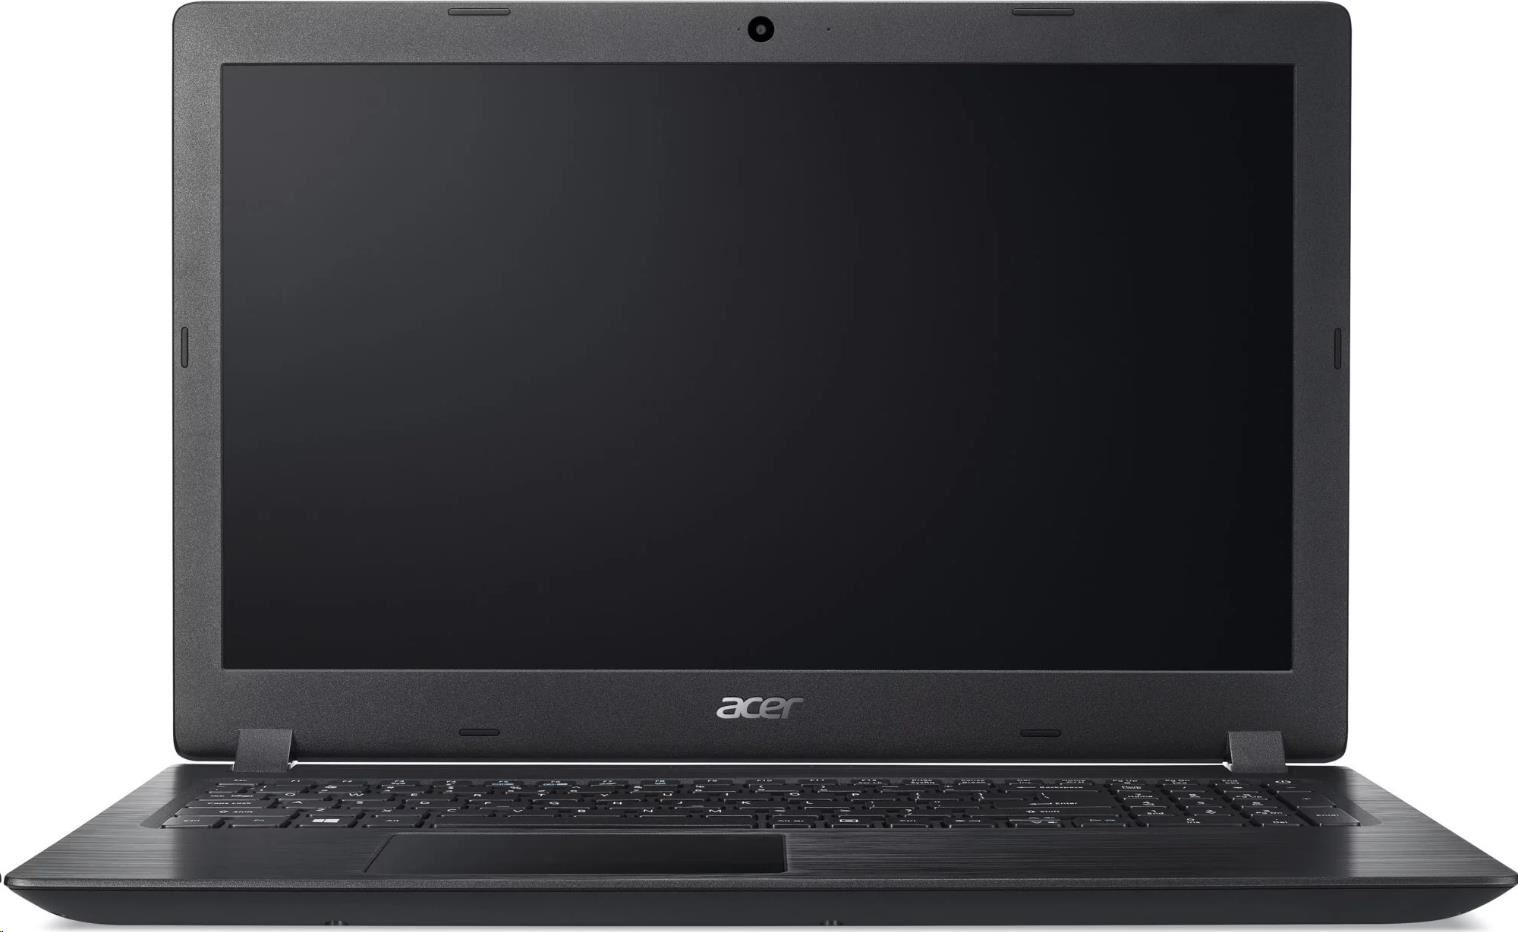 "ACER NTB Aspire 3 A315-21-626V - A6-9225@2.6GHz,15.6"" FHD mat,4GB,256SSD,noDVD,Radeon R4,HDMI,LAN,W10H"